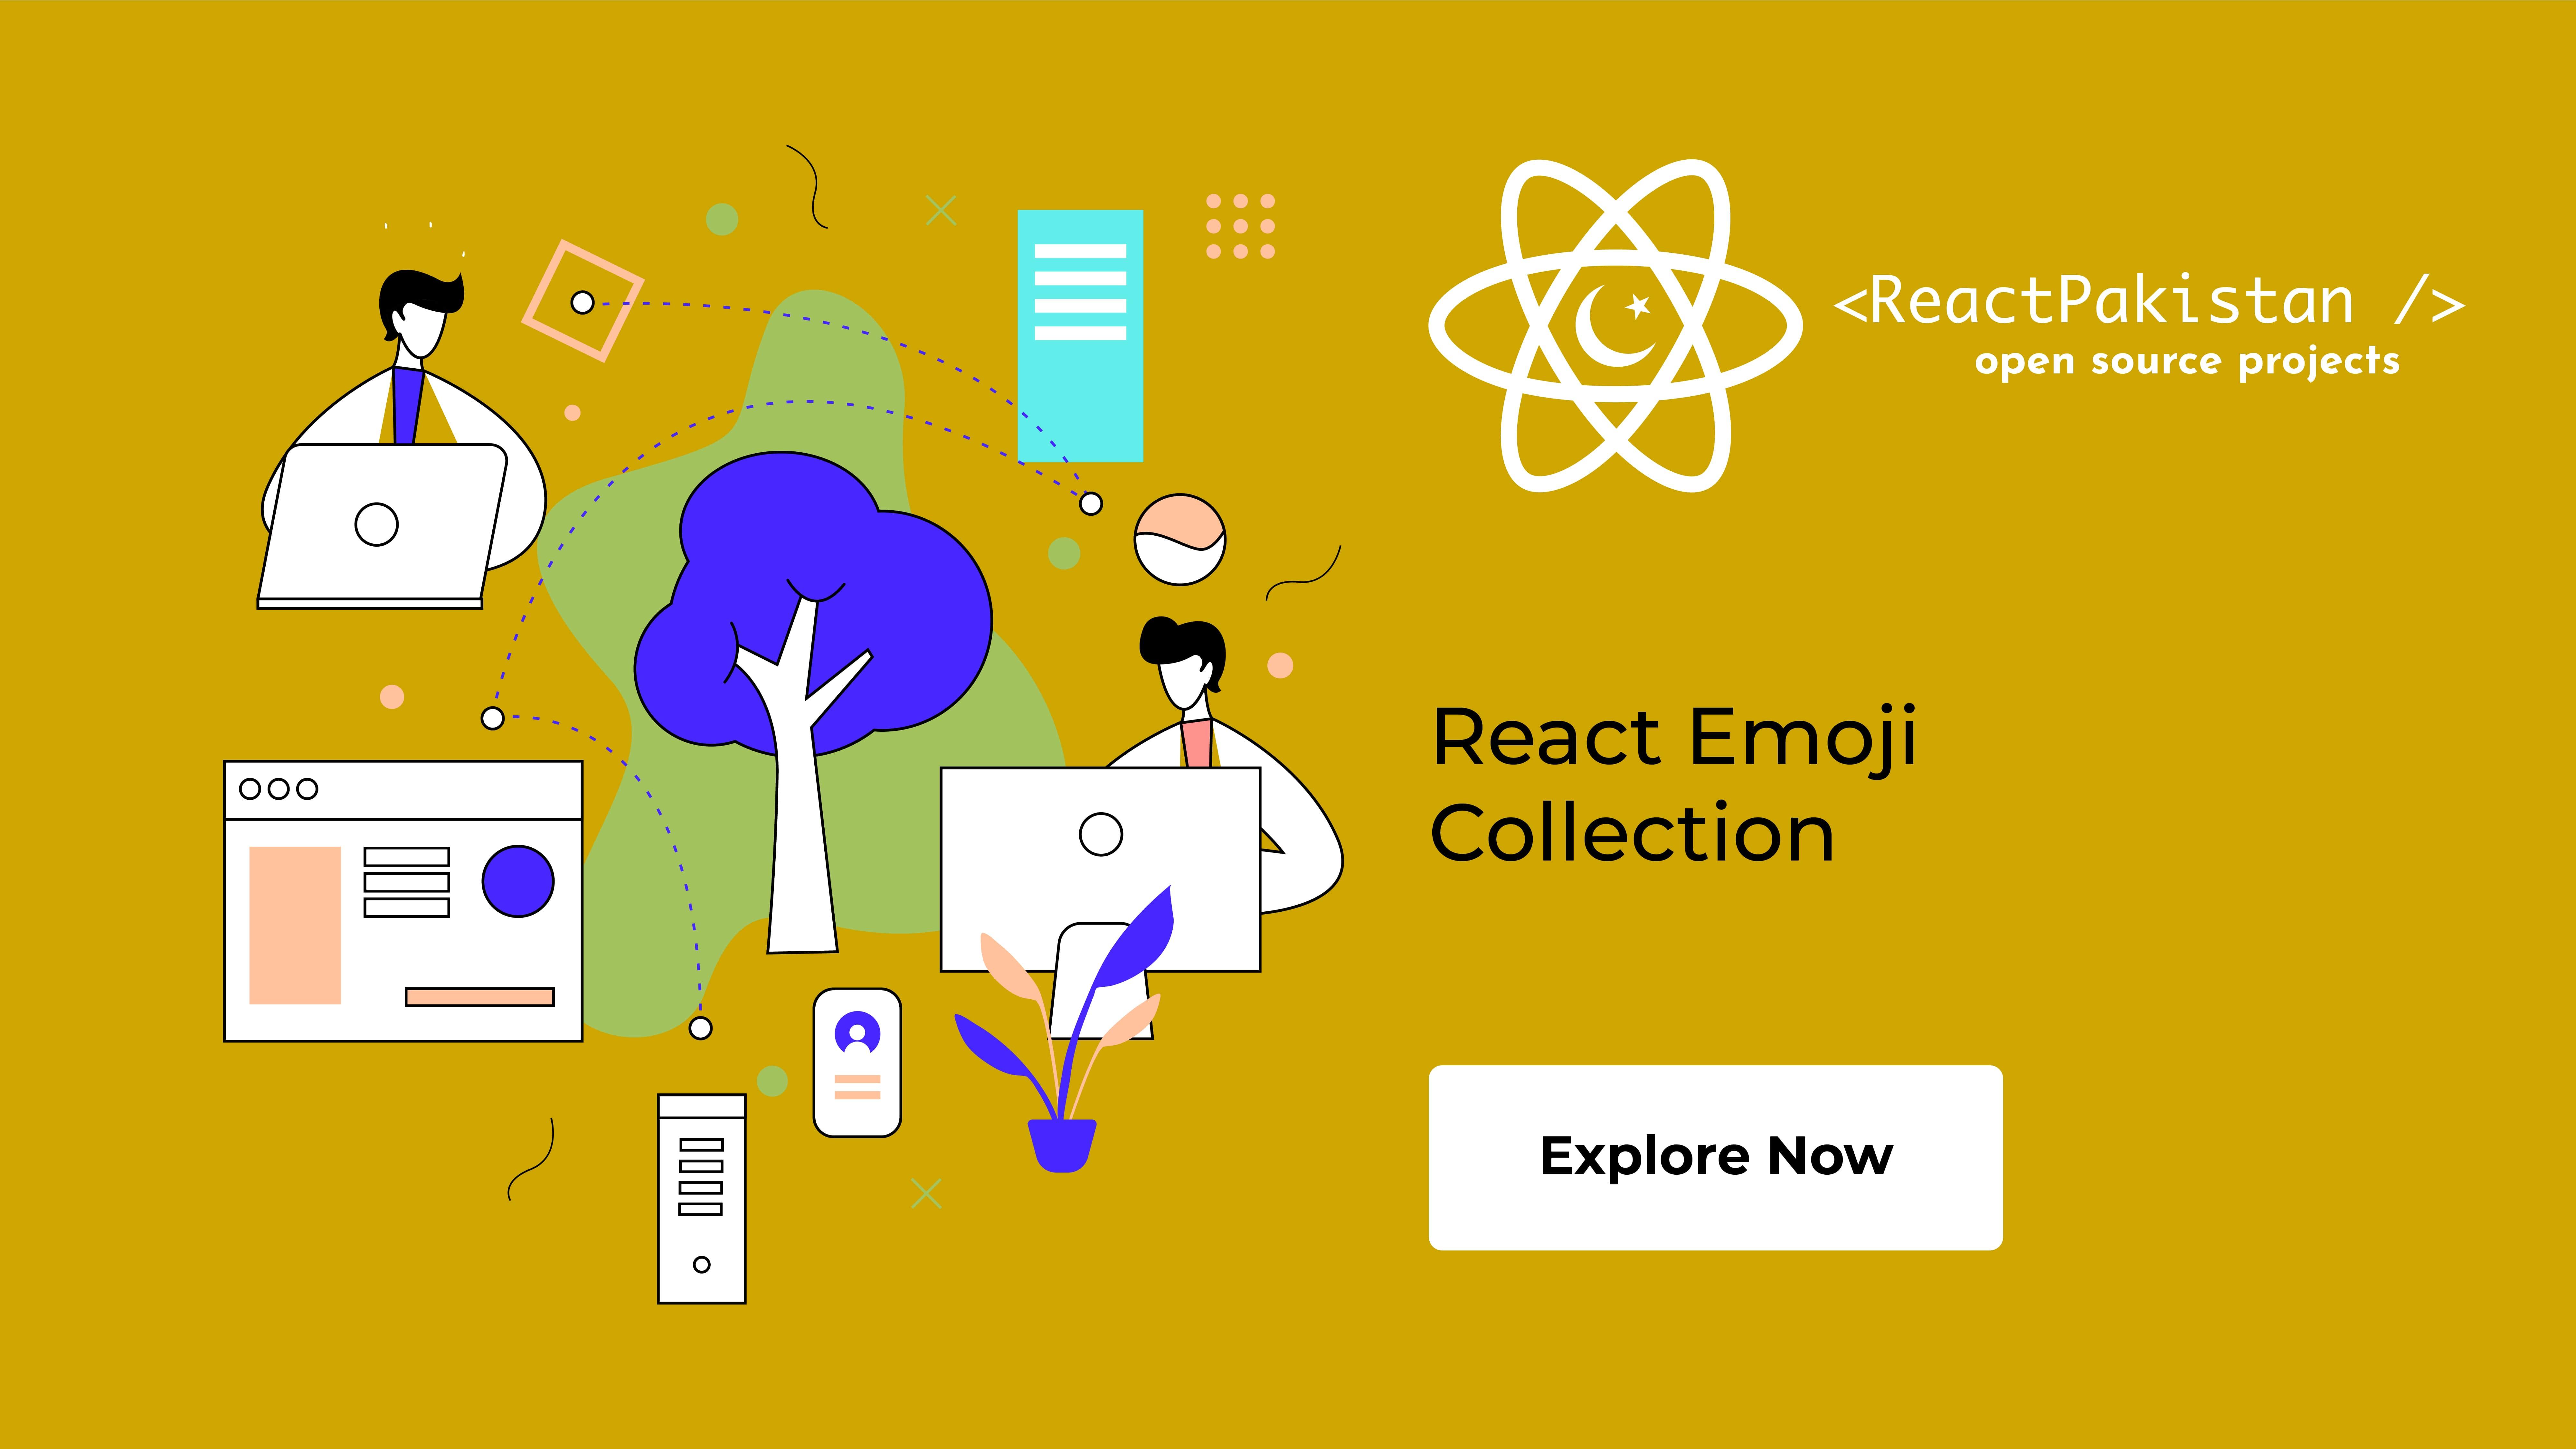 React Pakistan - React Emoji Collection